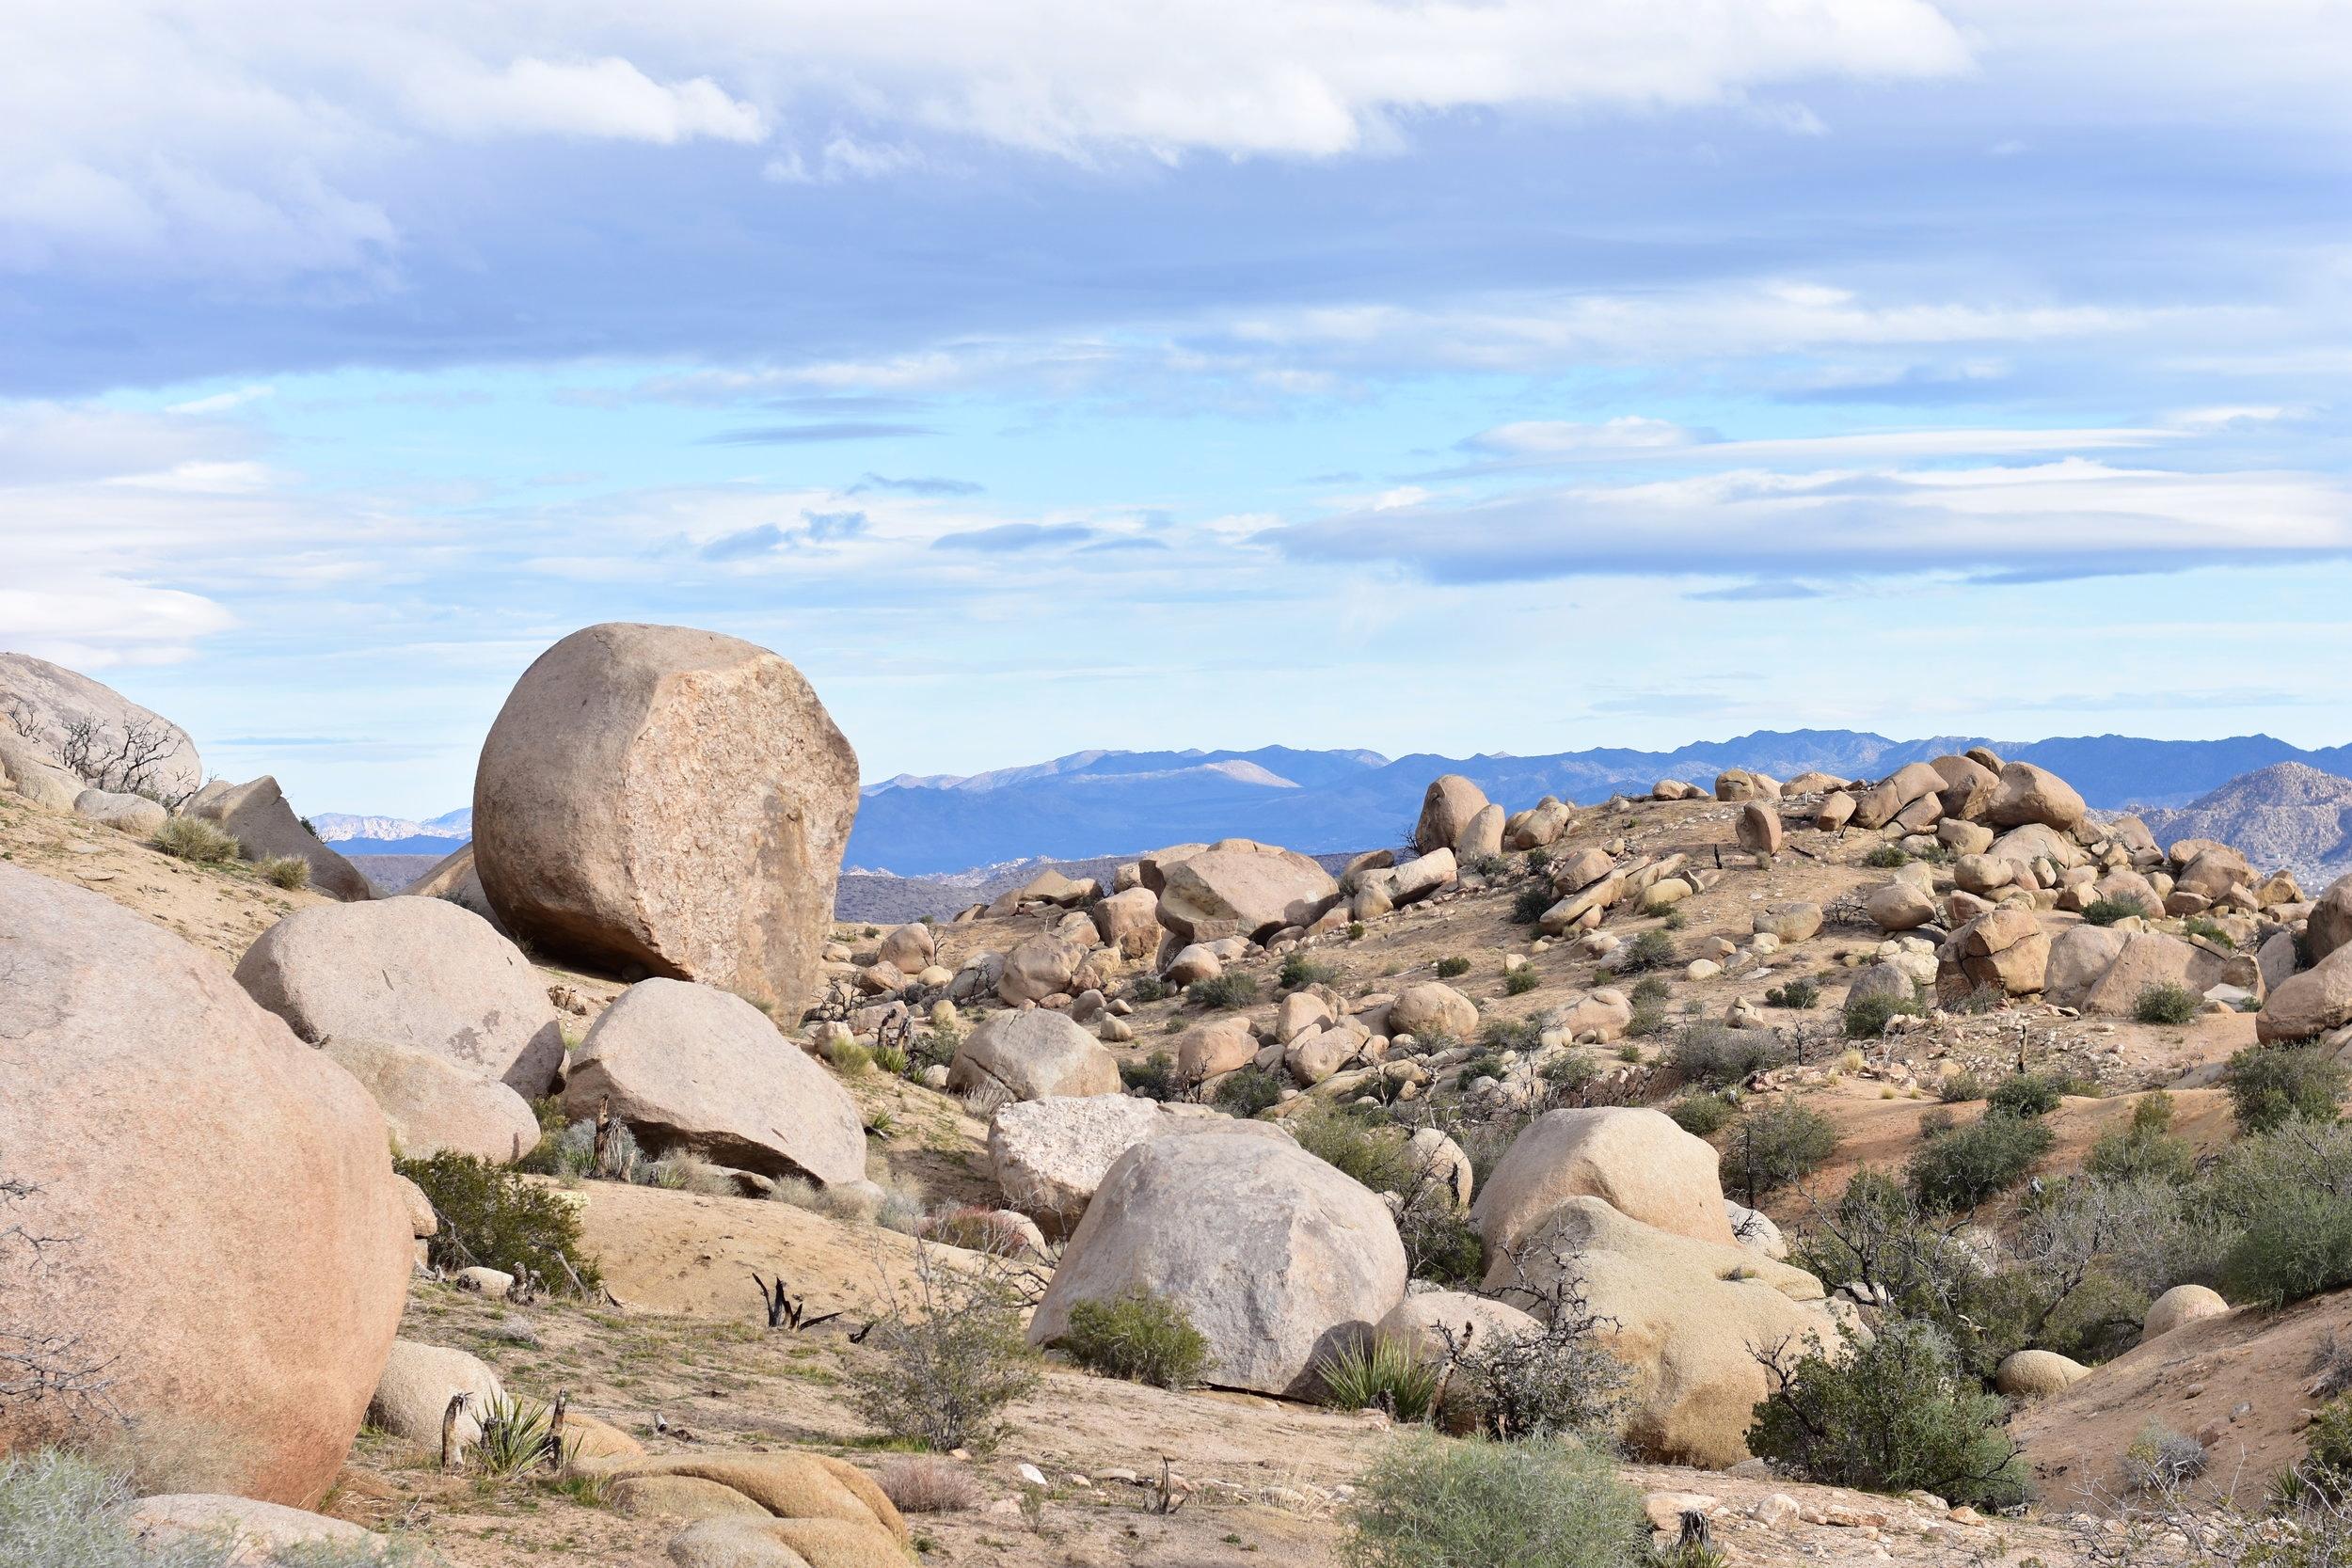 Garth's Boulders - Joshua Tree